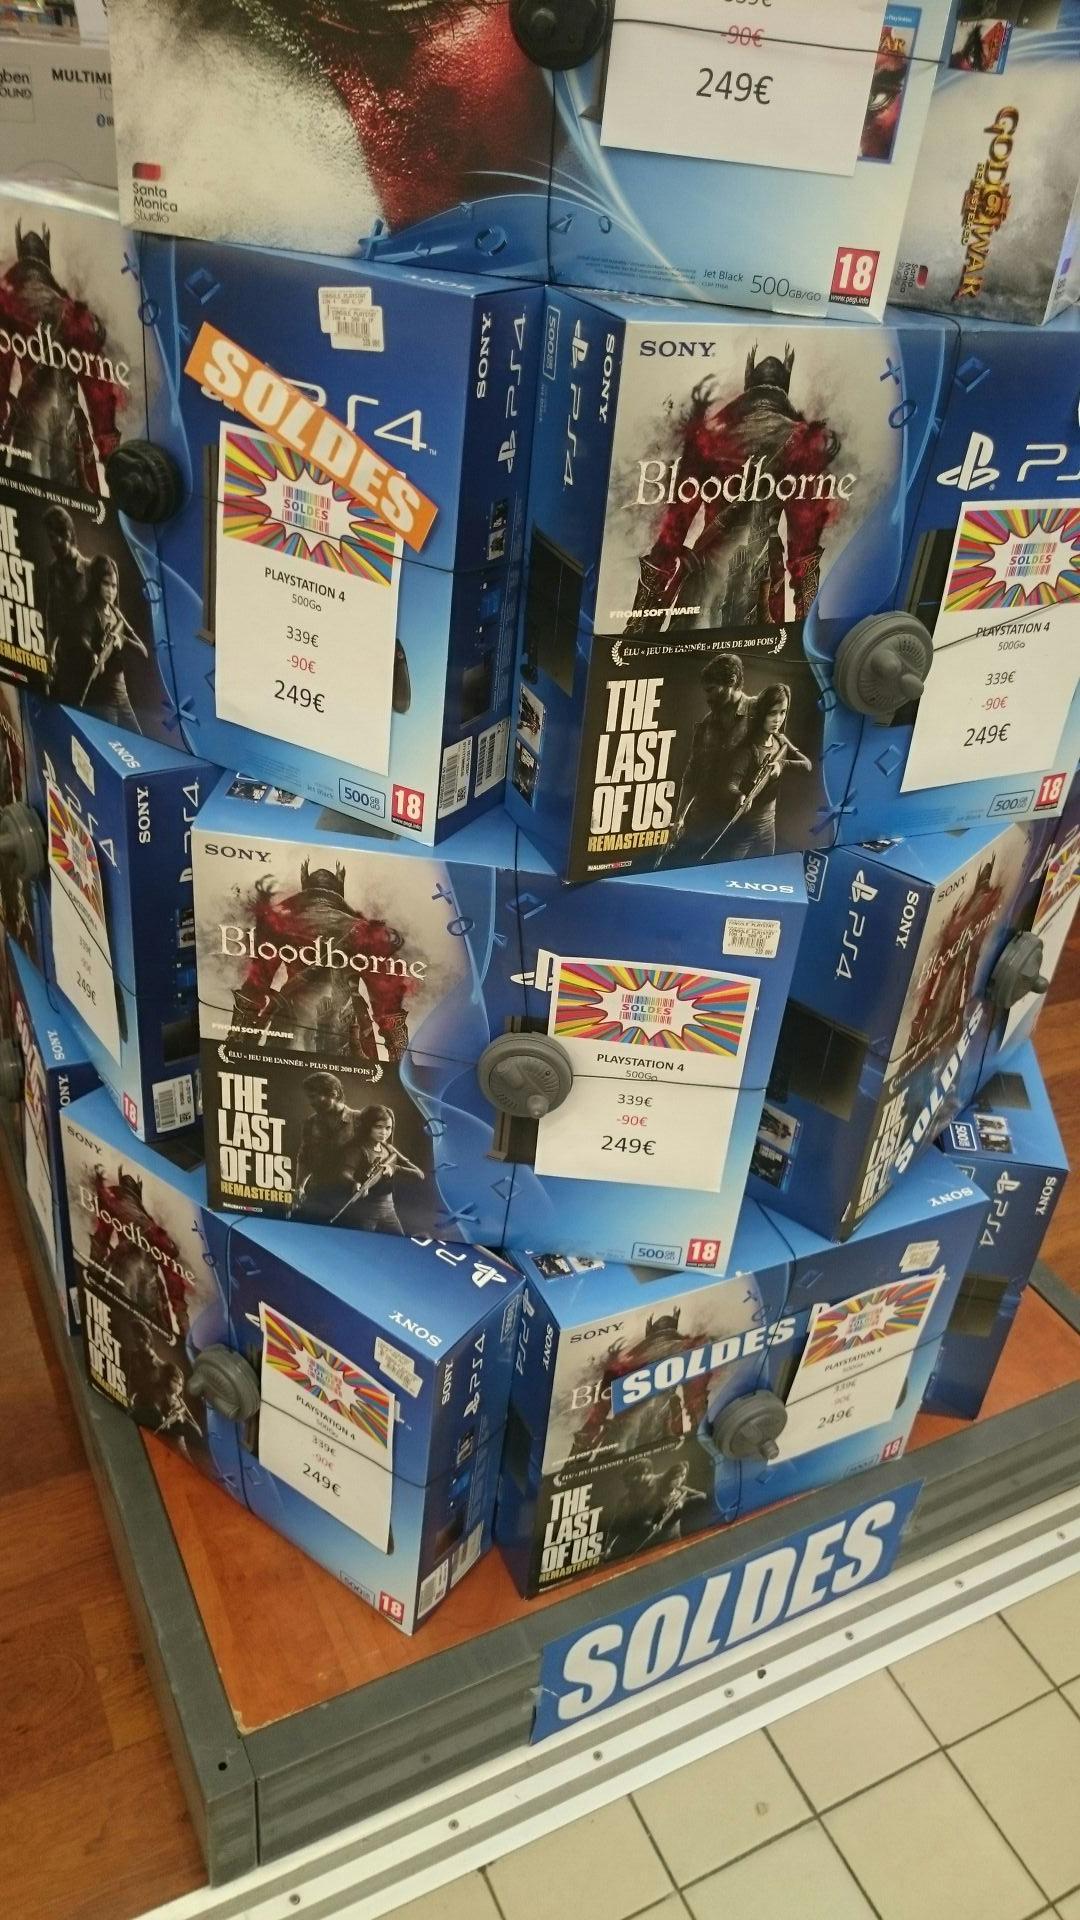 Sélection de packs Sony PS4 en soldes - Ex : Console Sony PS4 + Bloodborne + Last of Us